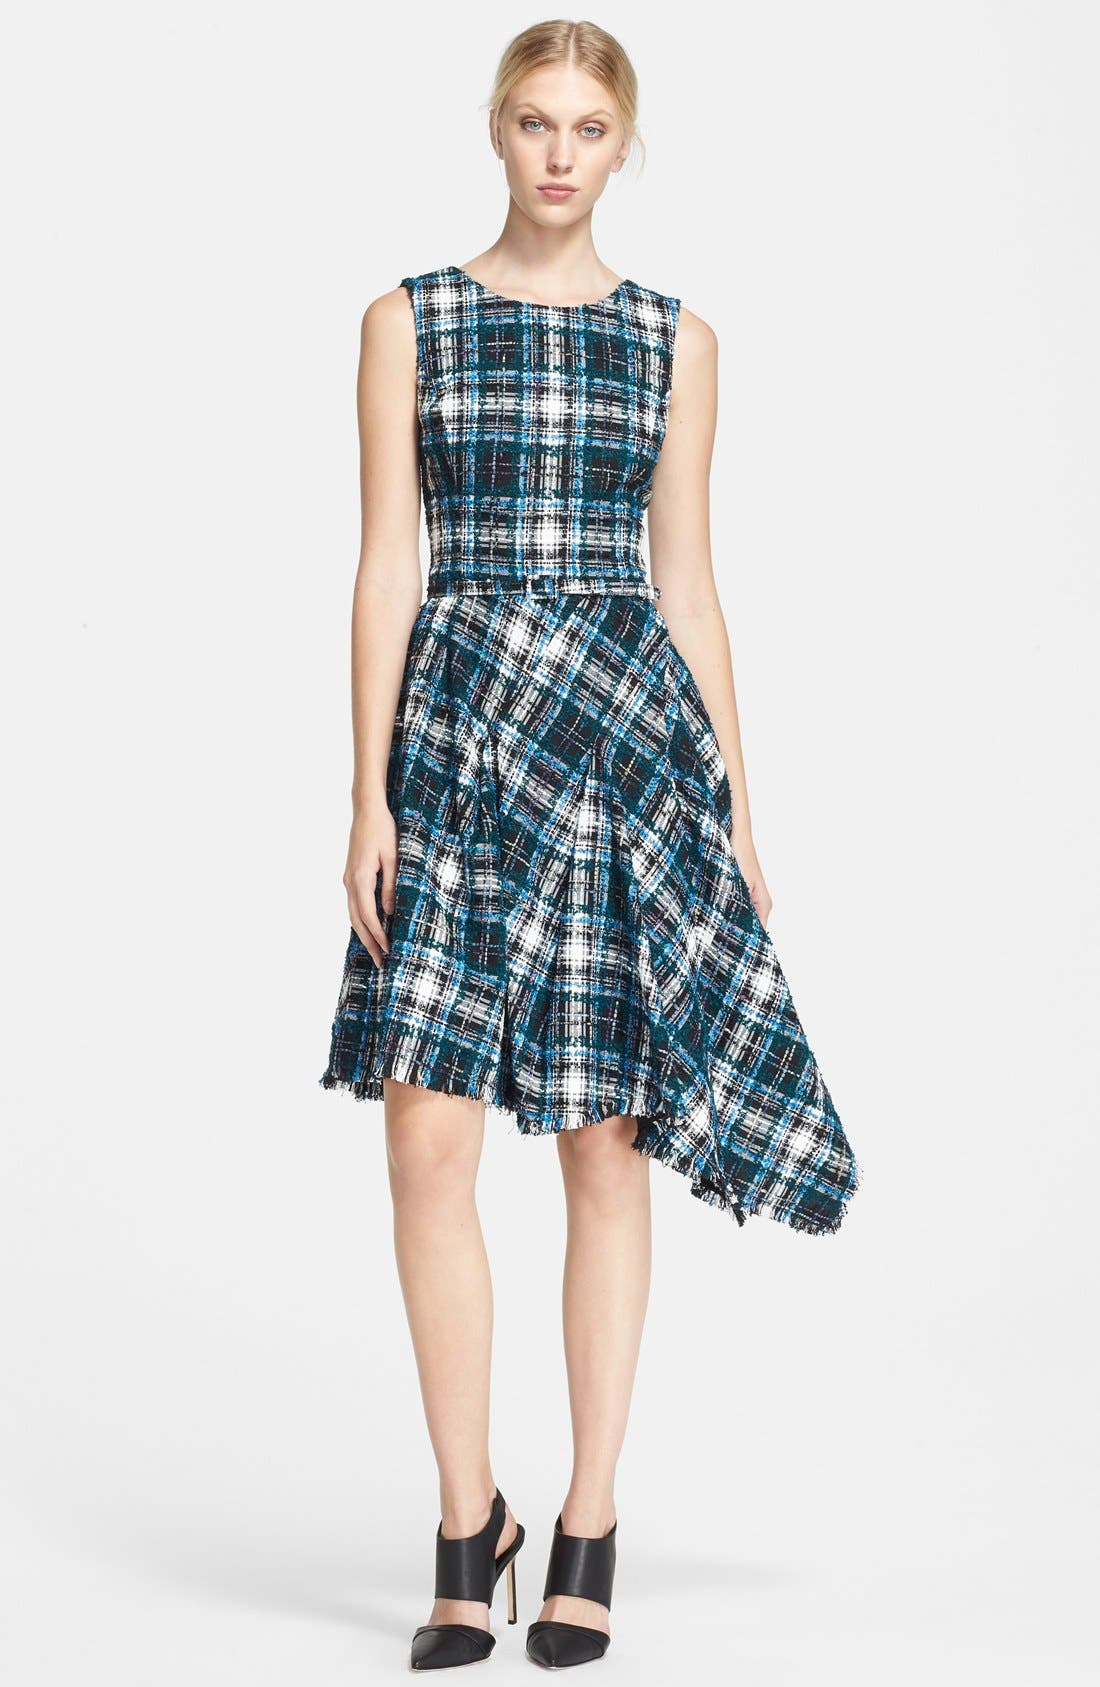 Alternate Image 1 Selected - Oscar de la Renta Asymmetrical Tweed Dress